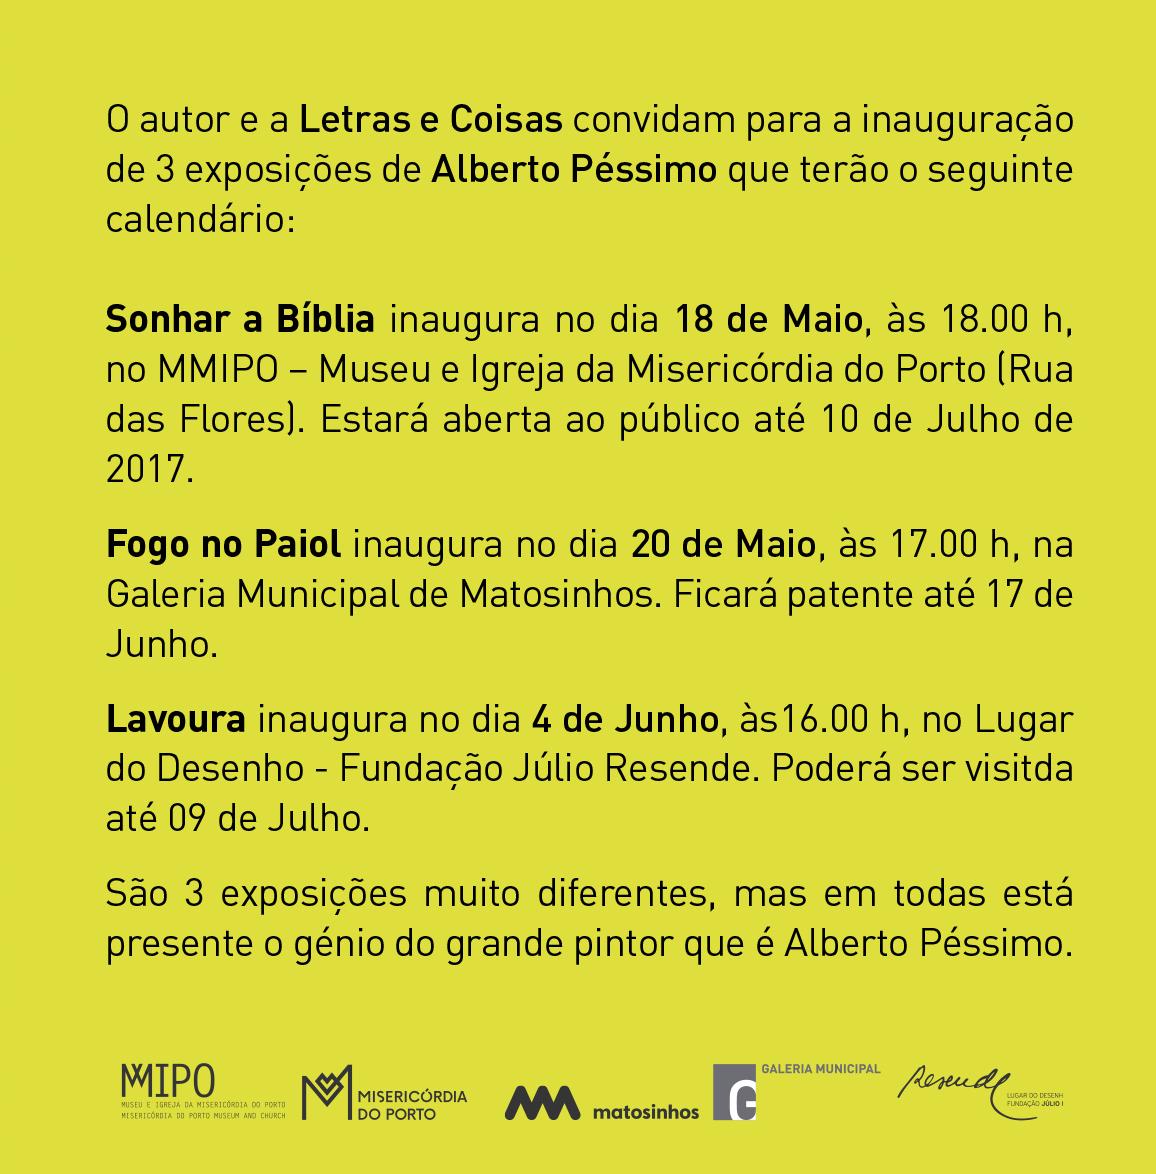 convite_LetrasCoisas_alberto_pessimo